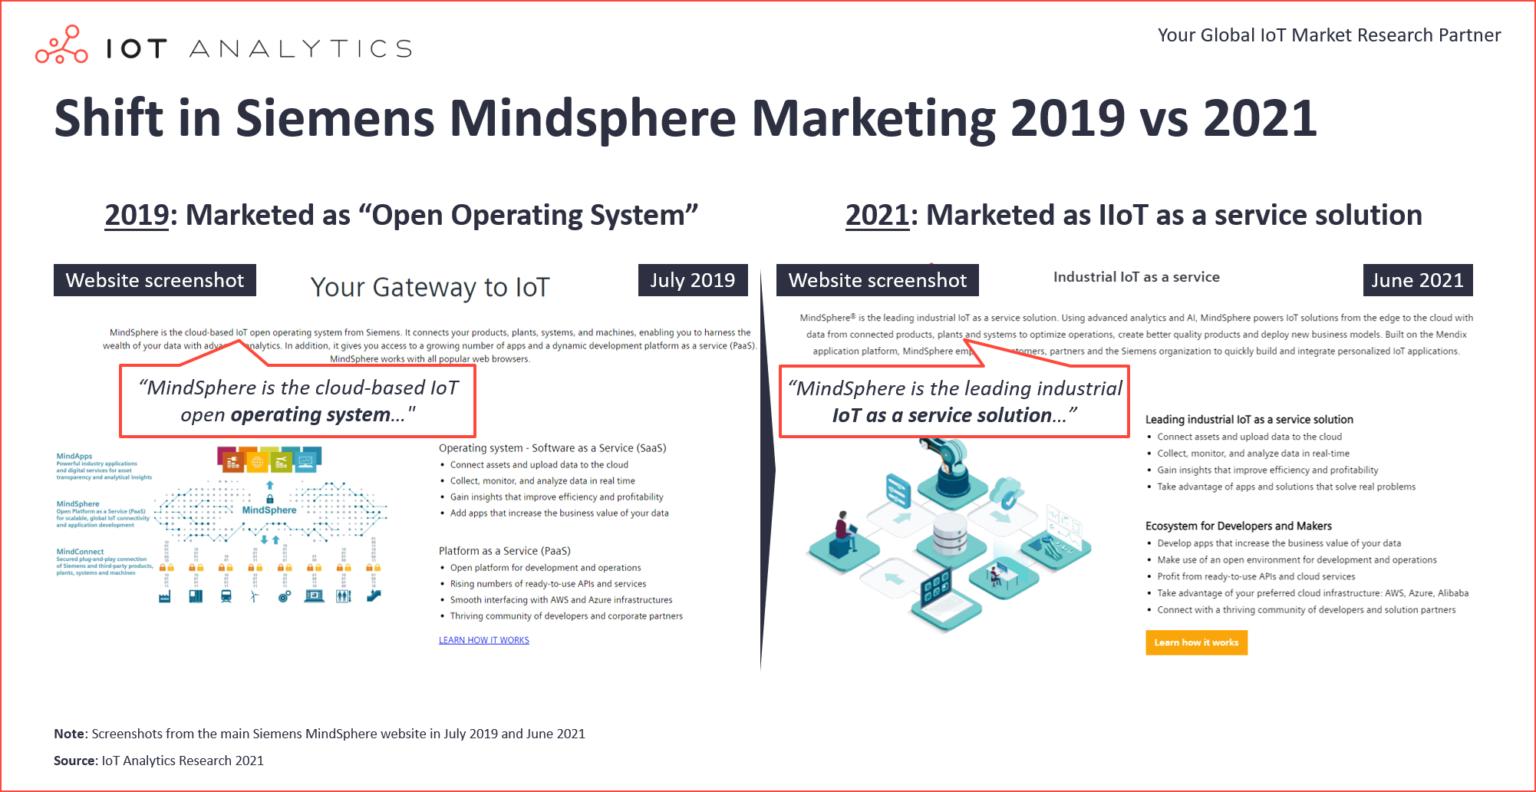 Shift-in-Siemens-MIndsphere-Marketing-2019-vs-2021-v2-1536x792.png (473 KB)